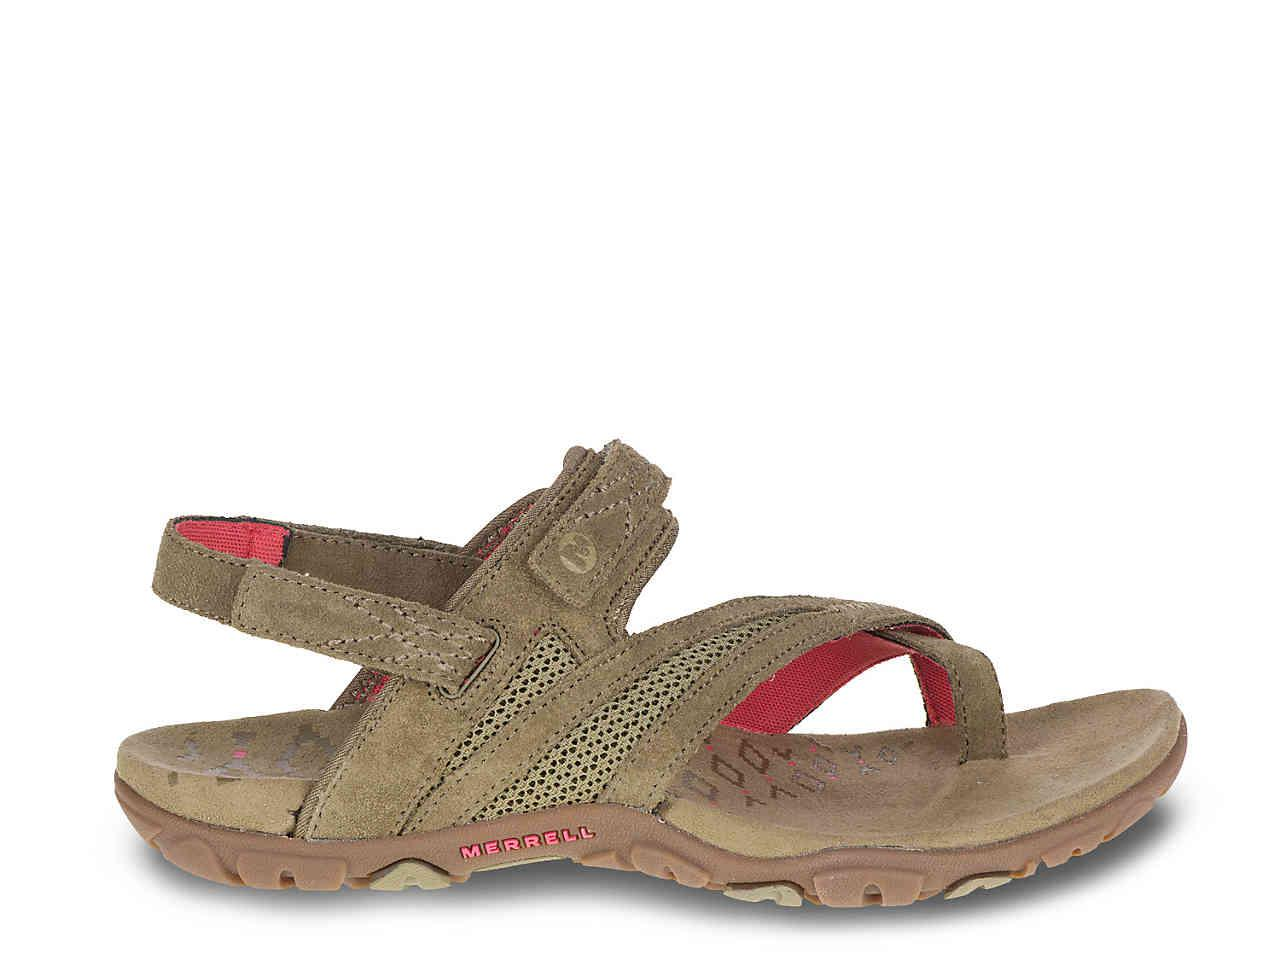 ffa7347a38e1 Lyst - Merrell Sandspur Delta Sport Sandal in Brown